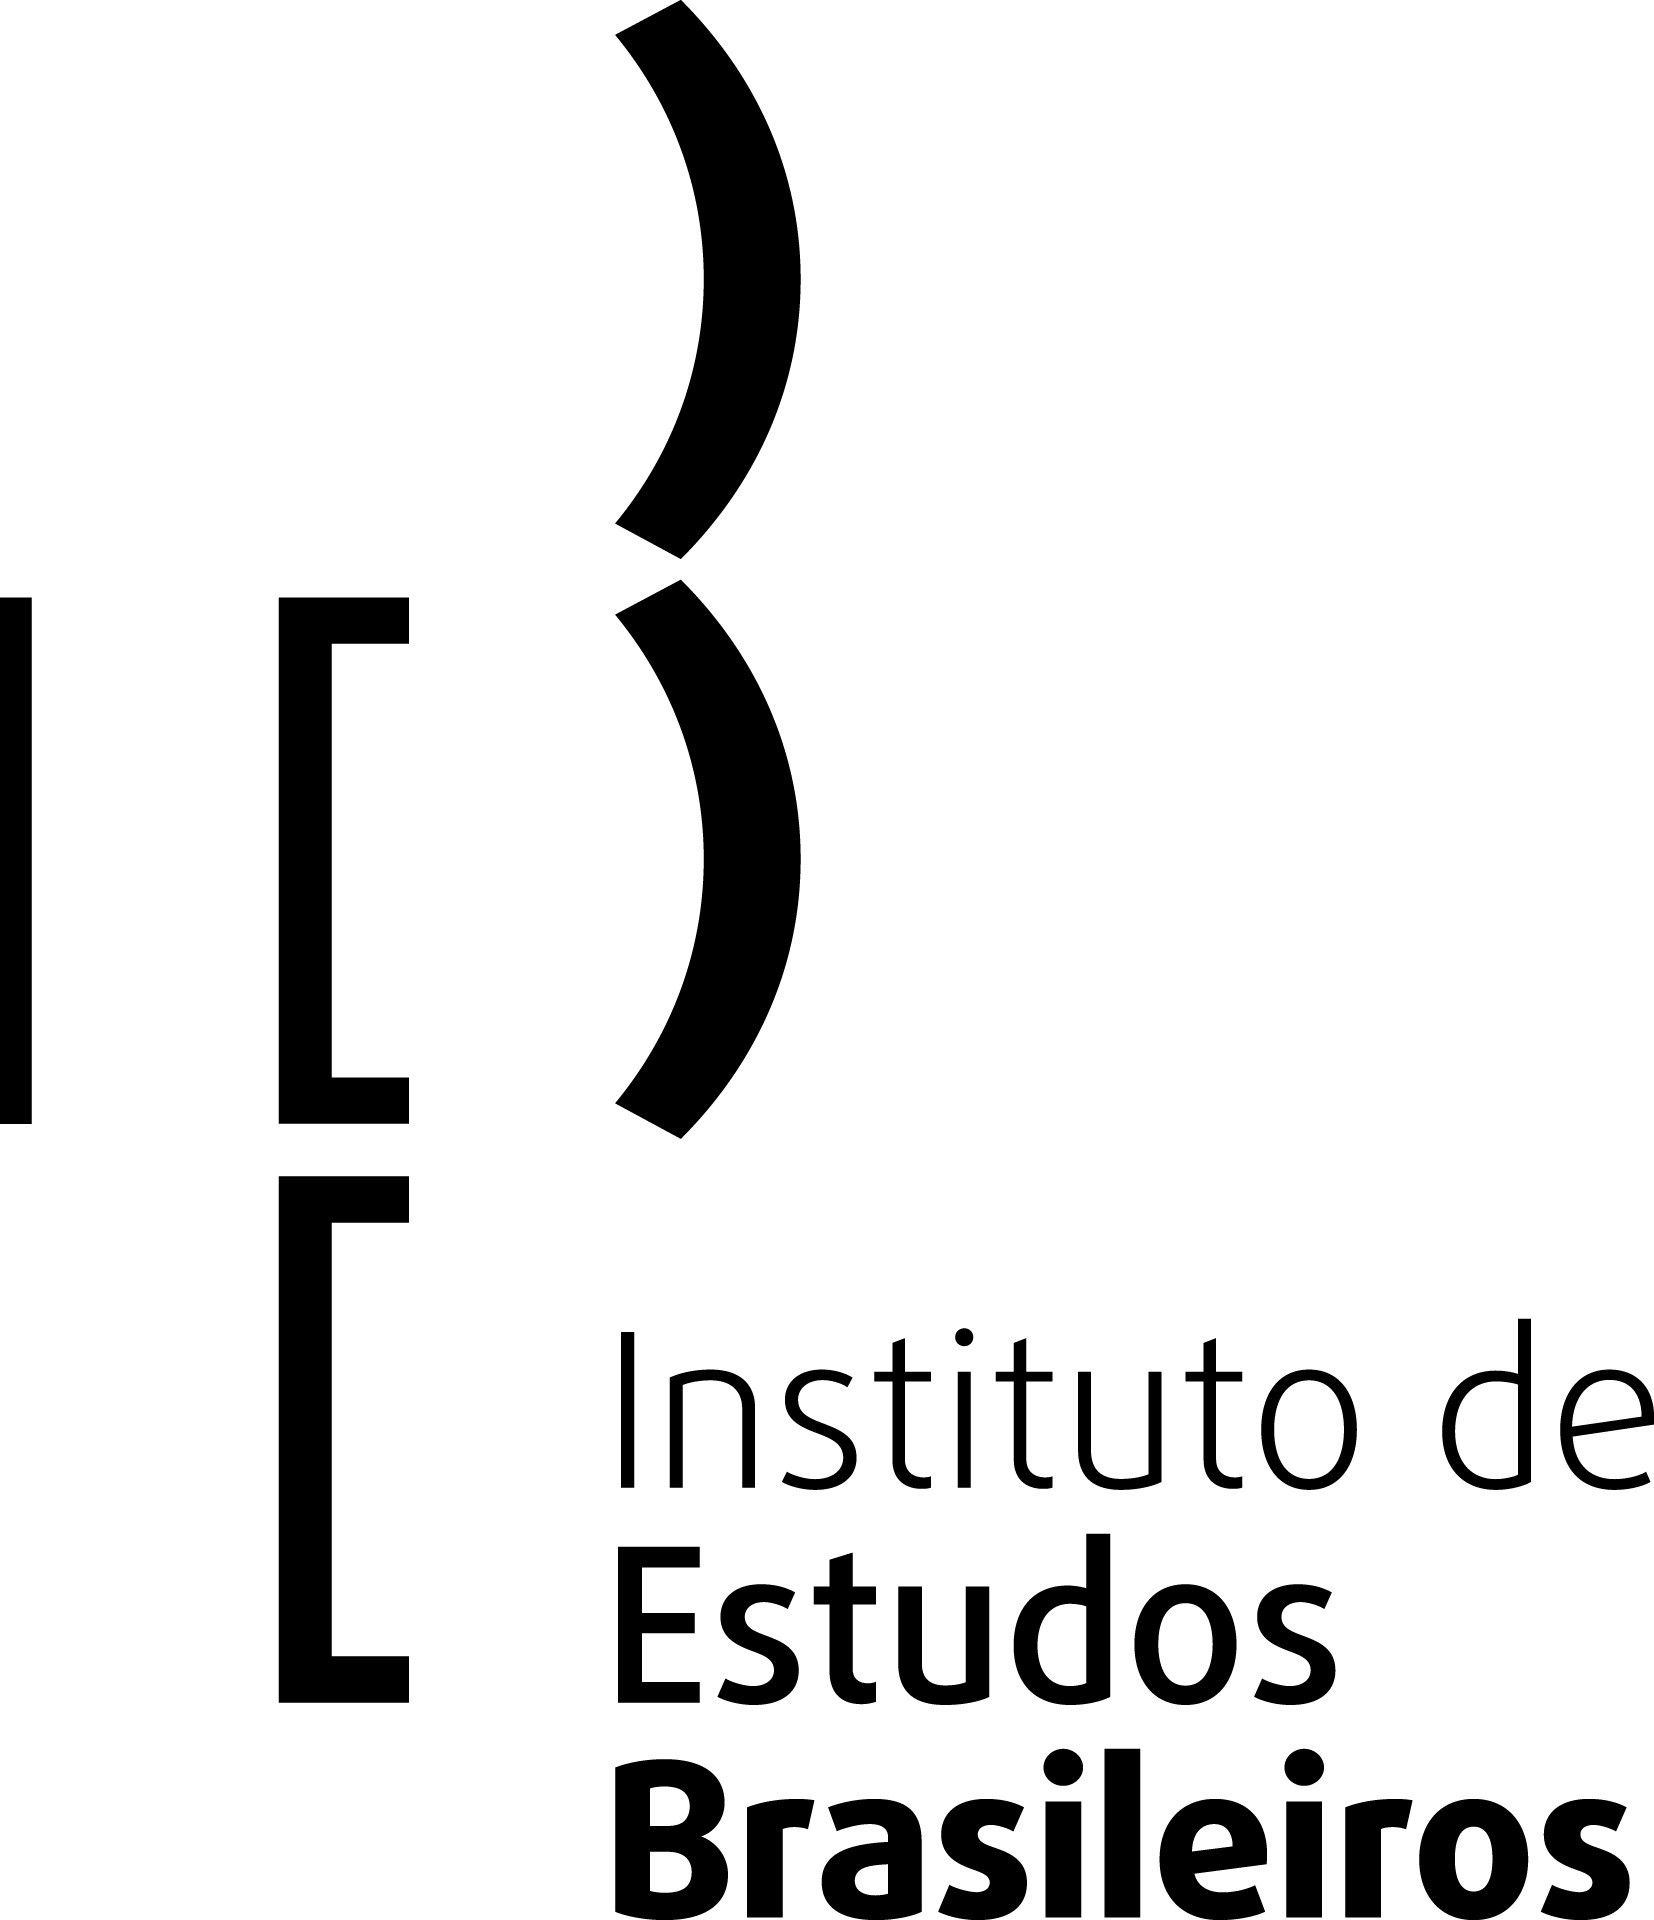 Logotipo – Instituto de Estudos Brasileiros – IEB » USP Imagens | Logotipo,  Estudos, Comida brasileira